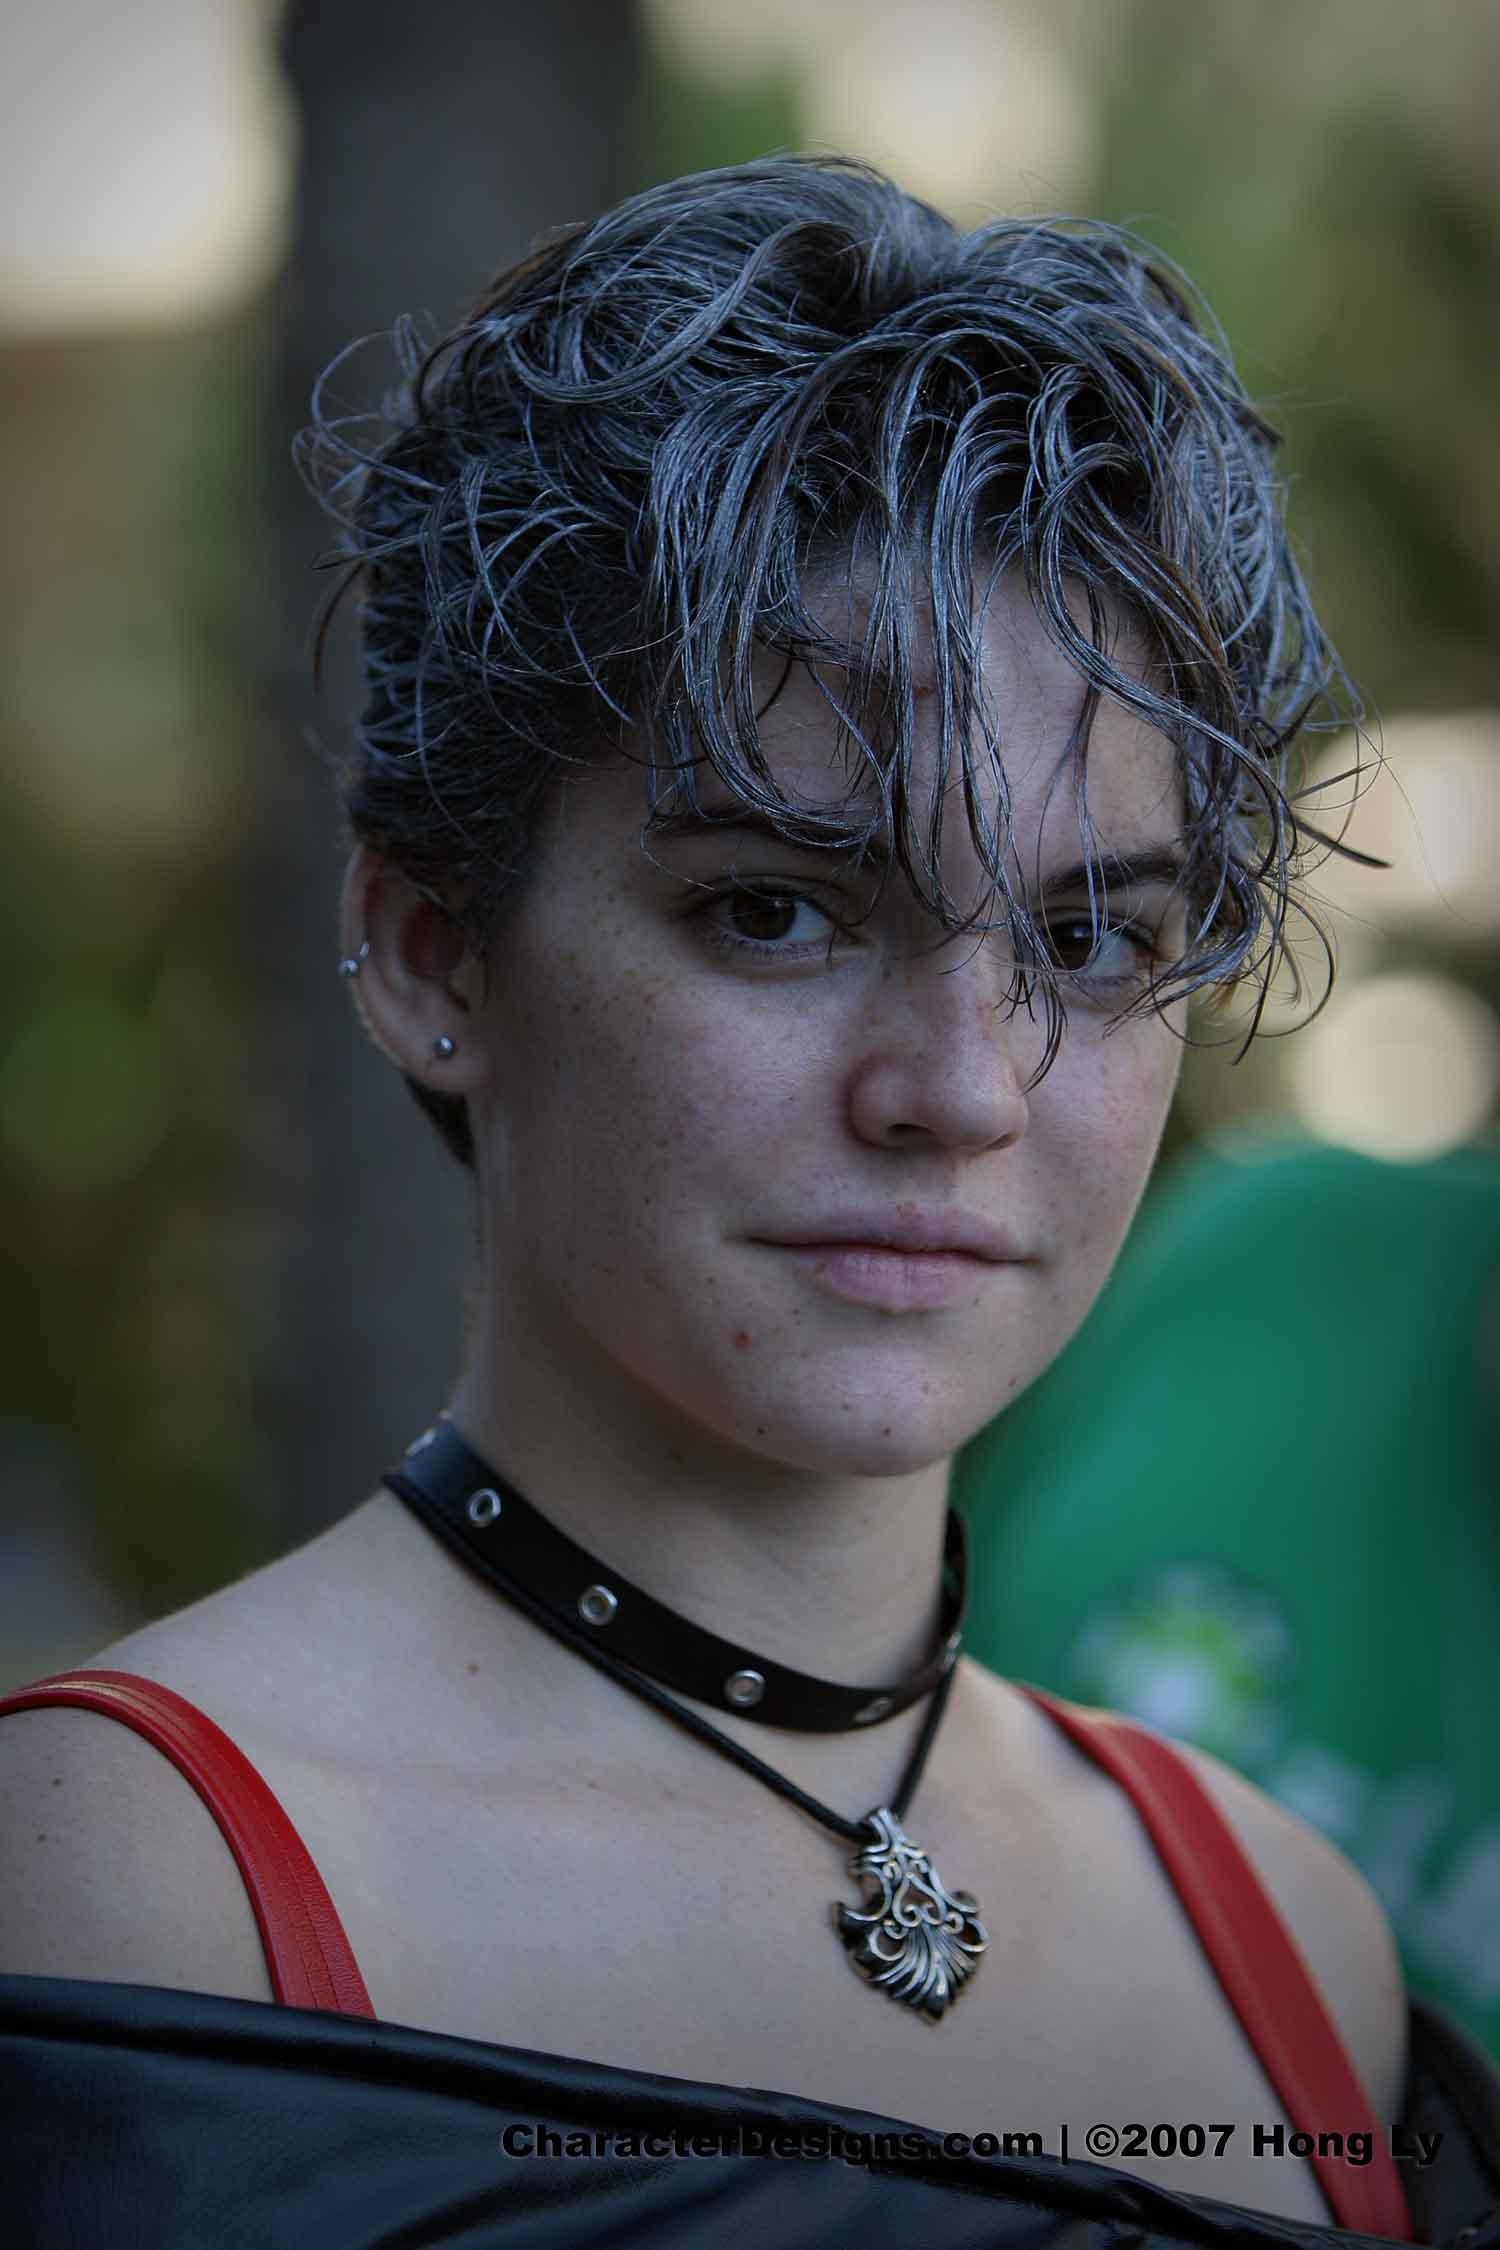 Faces_of_AX_2006_252.jpg